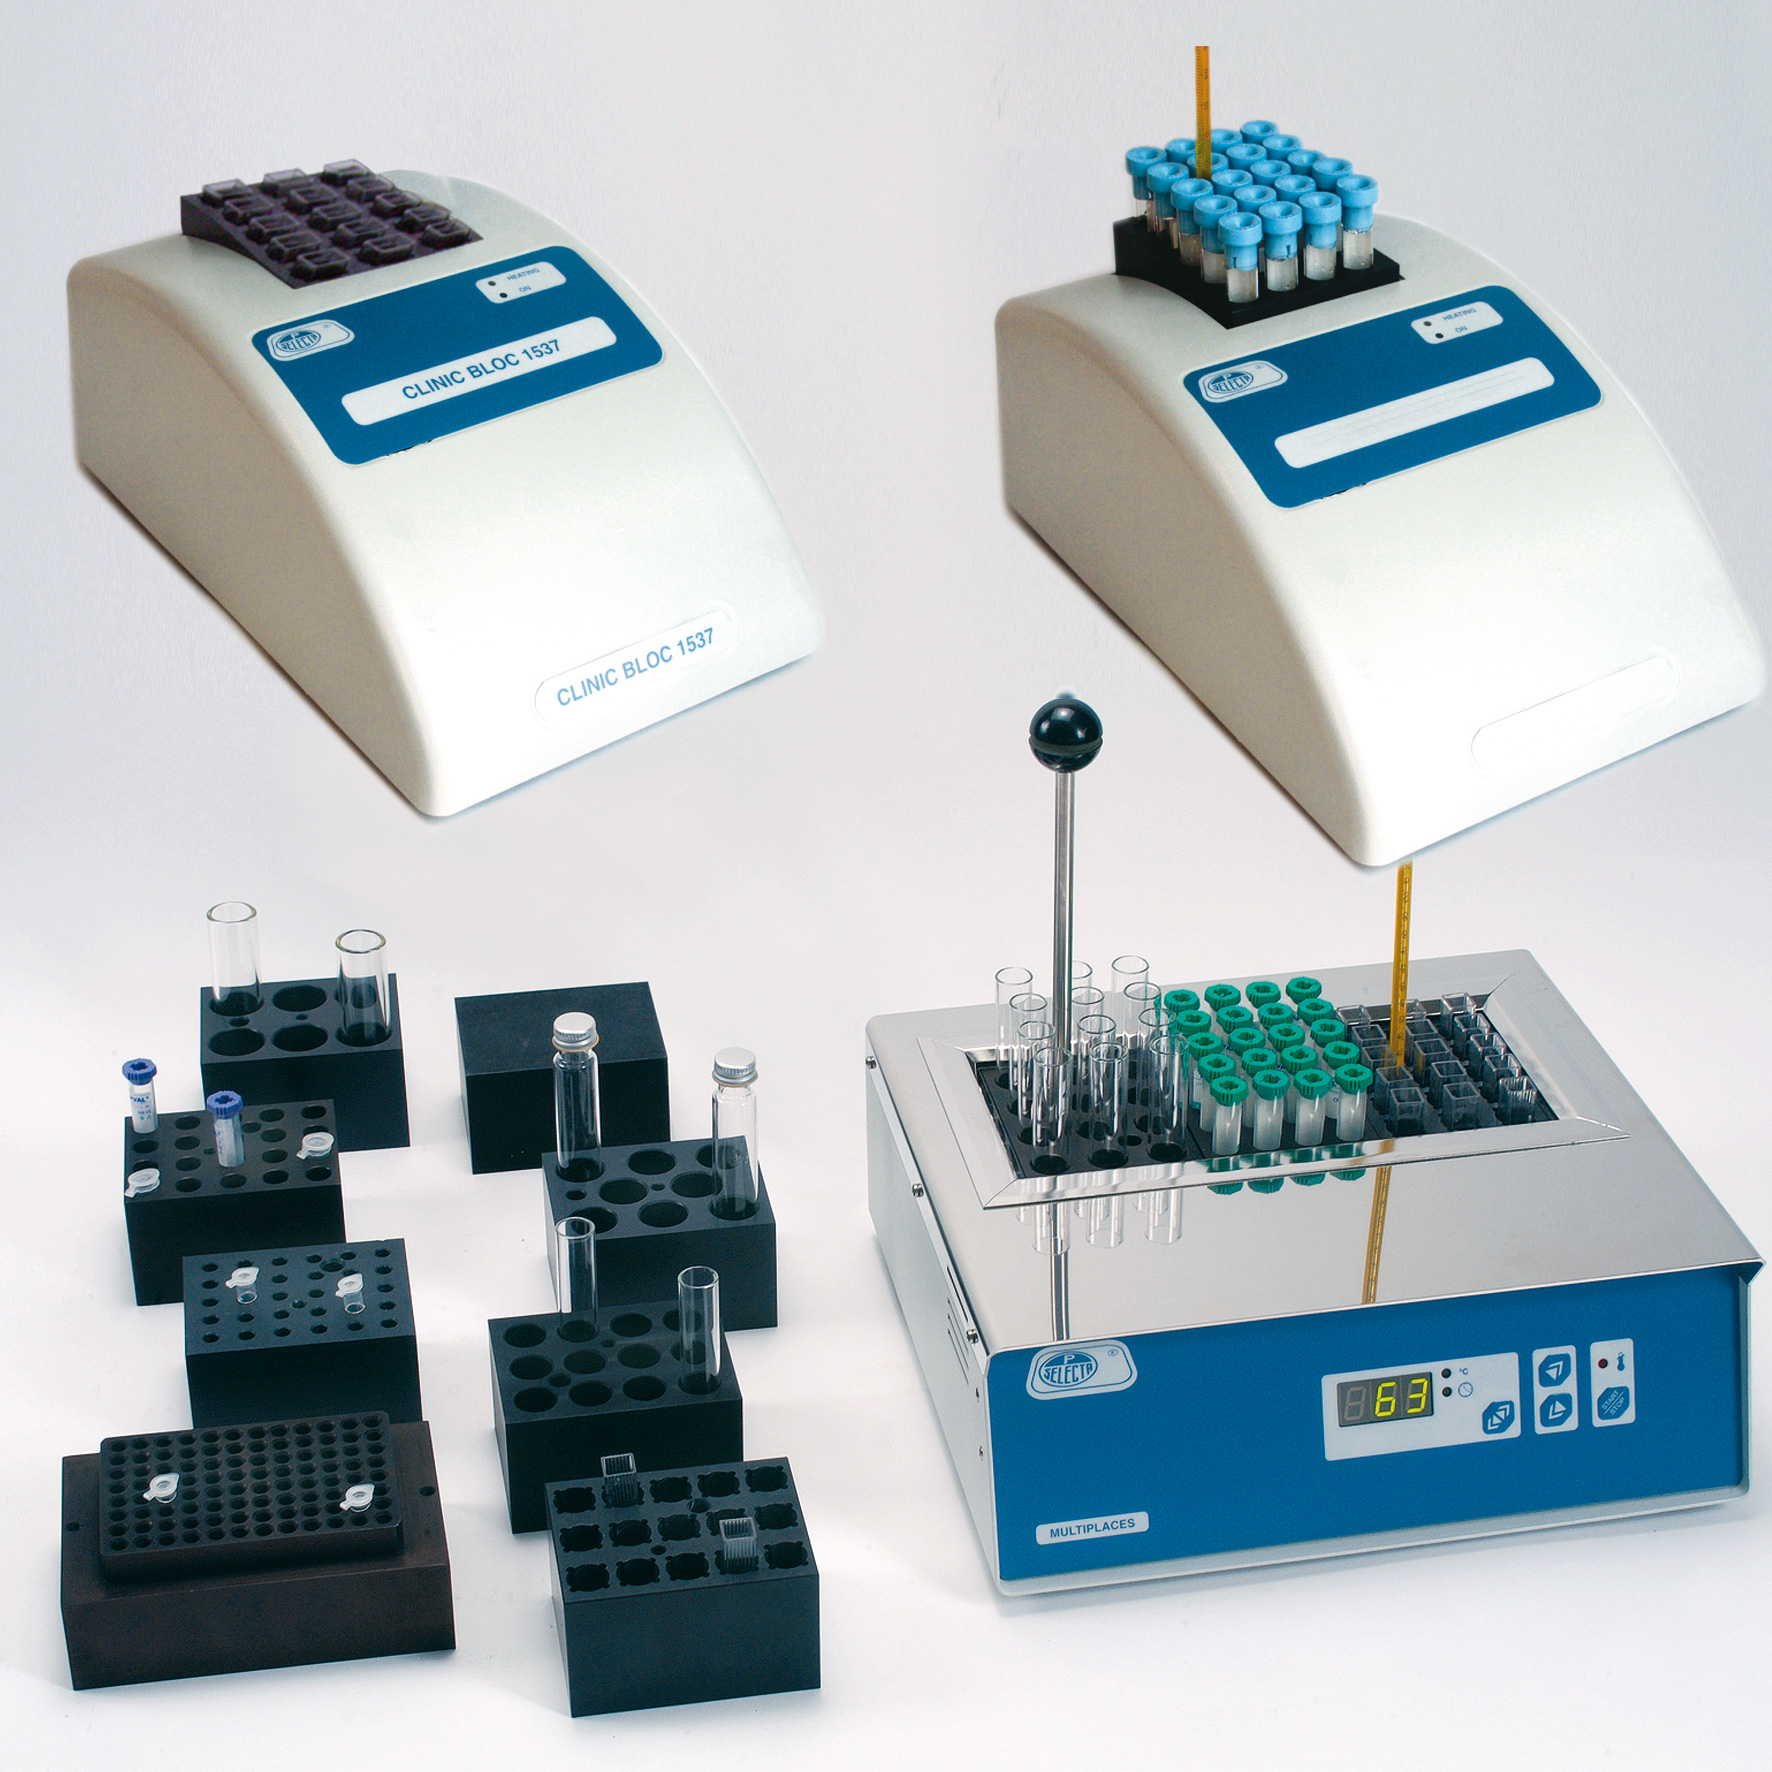 Thermostat dry-blocks